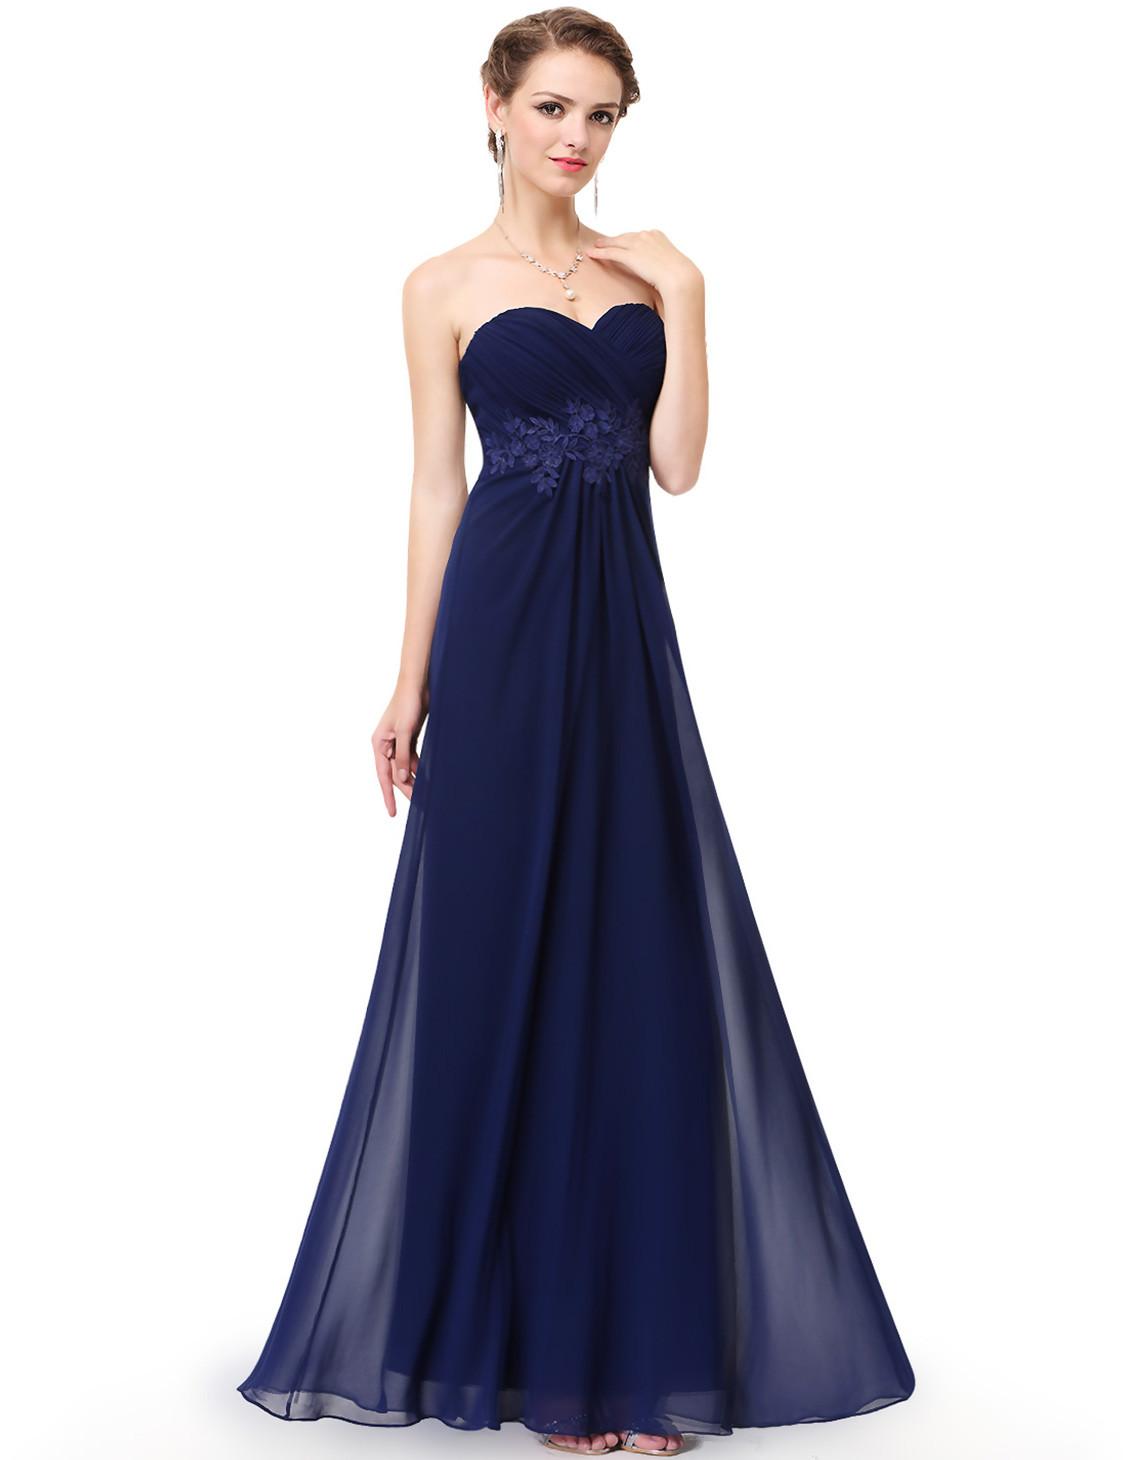 Navy Strapless Long Sweetheart Neckline Bridesmaid Dress